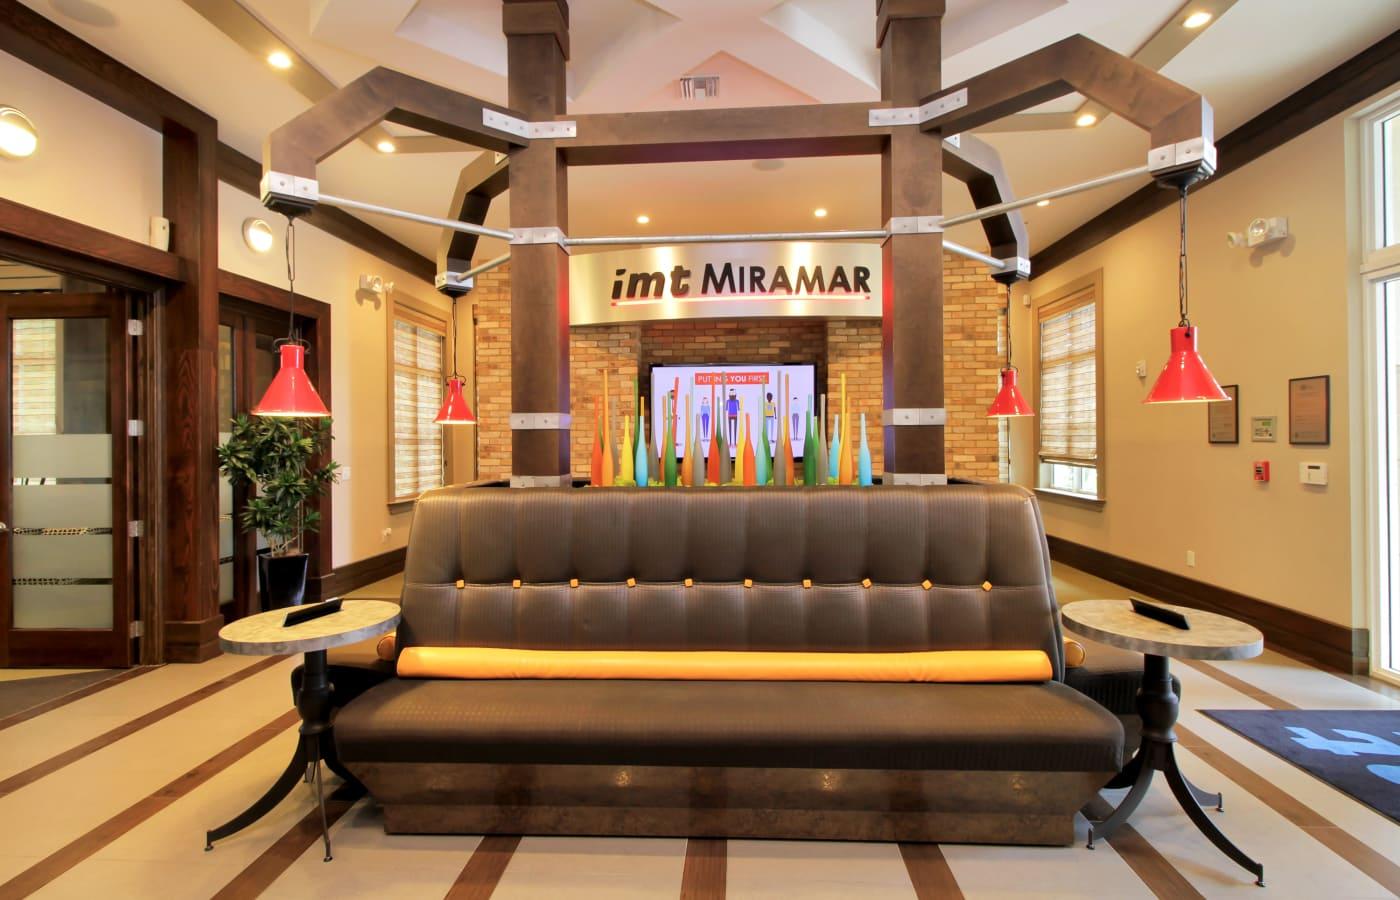 Leasing office interior at IMT Miramar in Miramar, FL